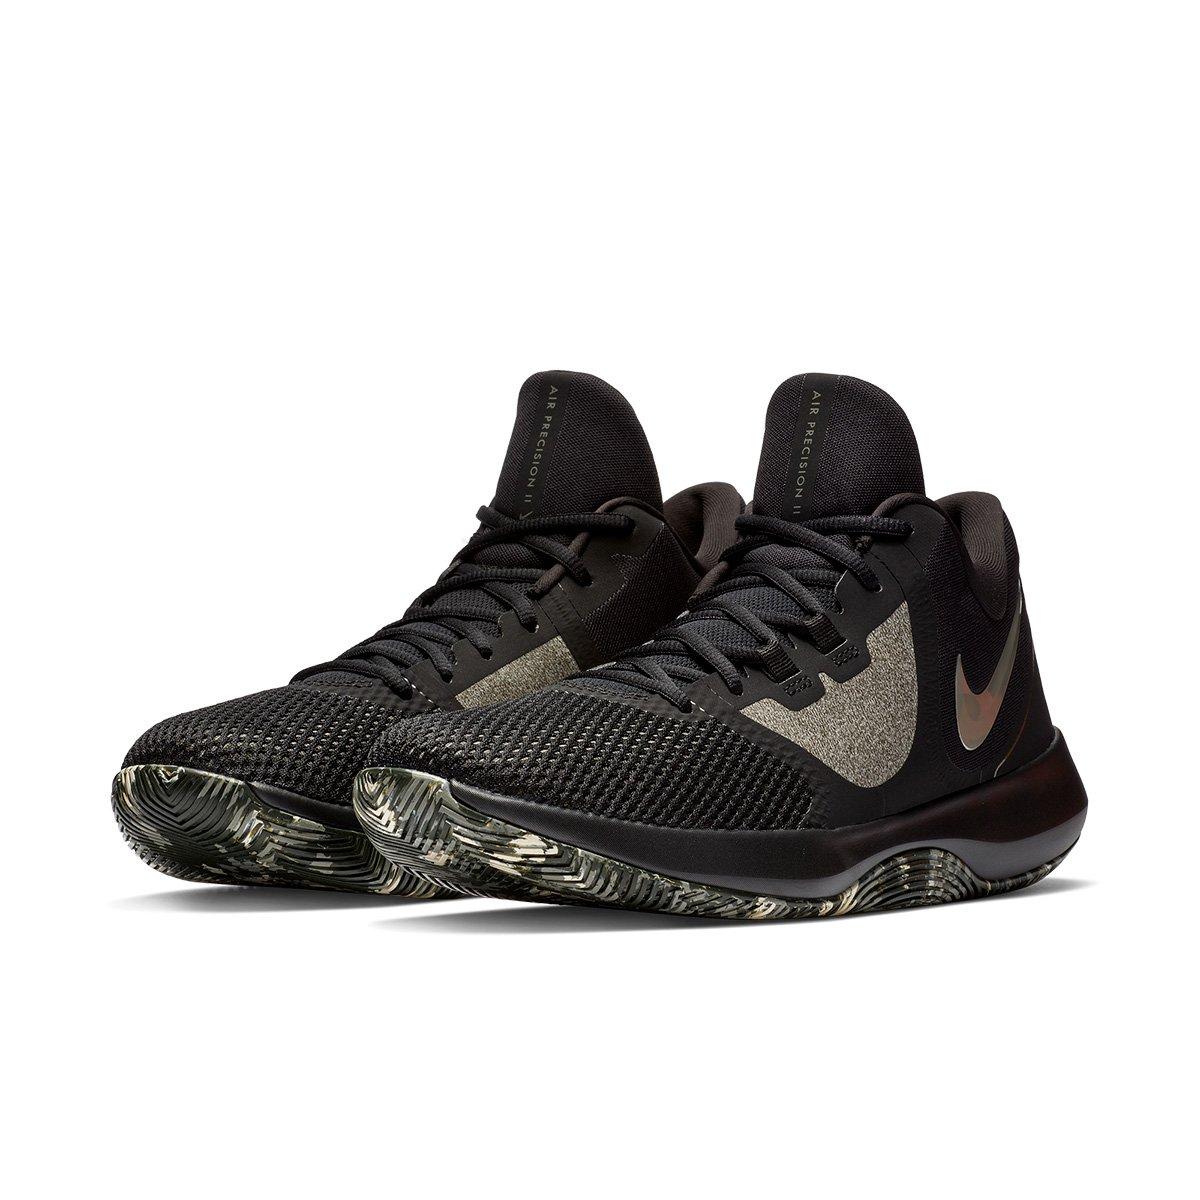 Tênis Nike NBA Air Precision II Masculino Compre Agora Loja NBA Nike 1b16b6 d6b75cfc83041